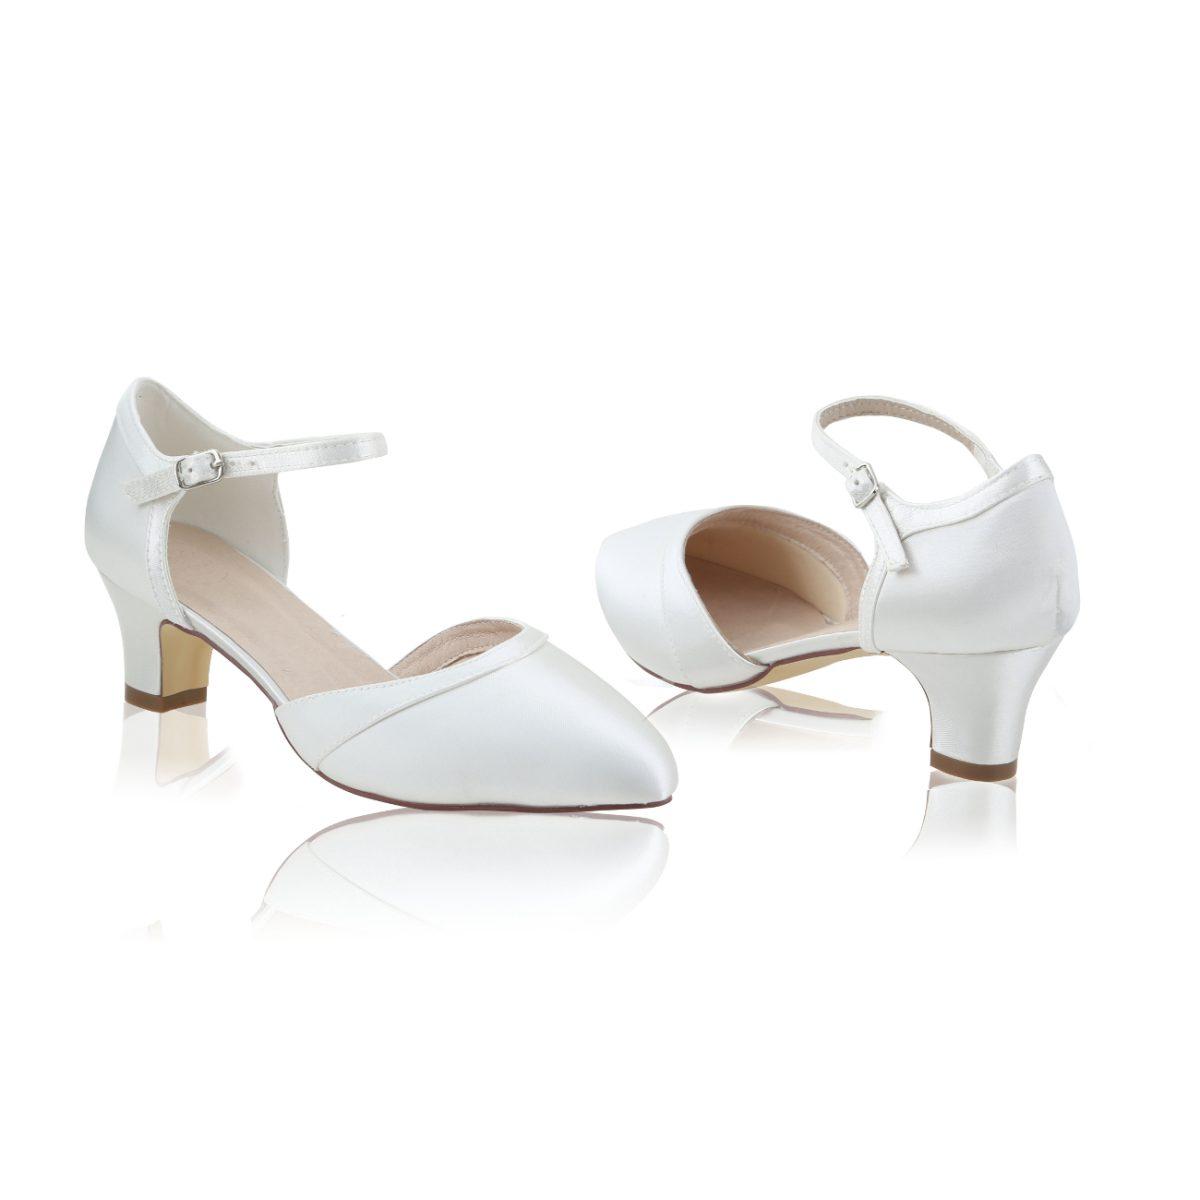 Perfect Bridal Ingrid Shoes - Satin